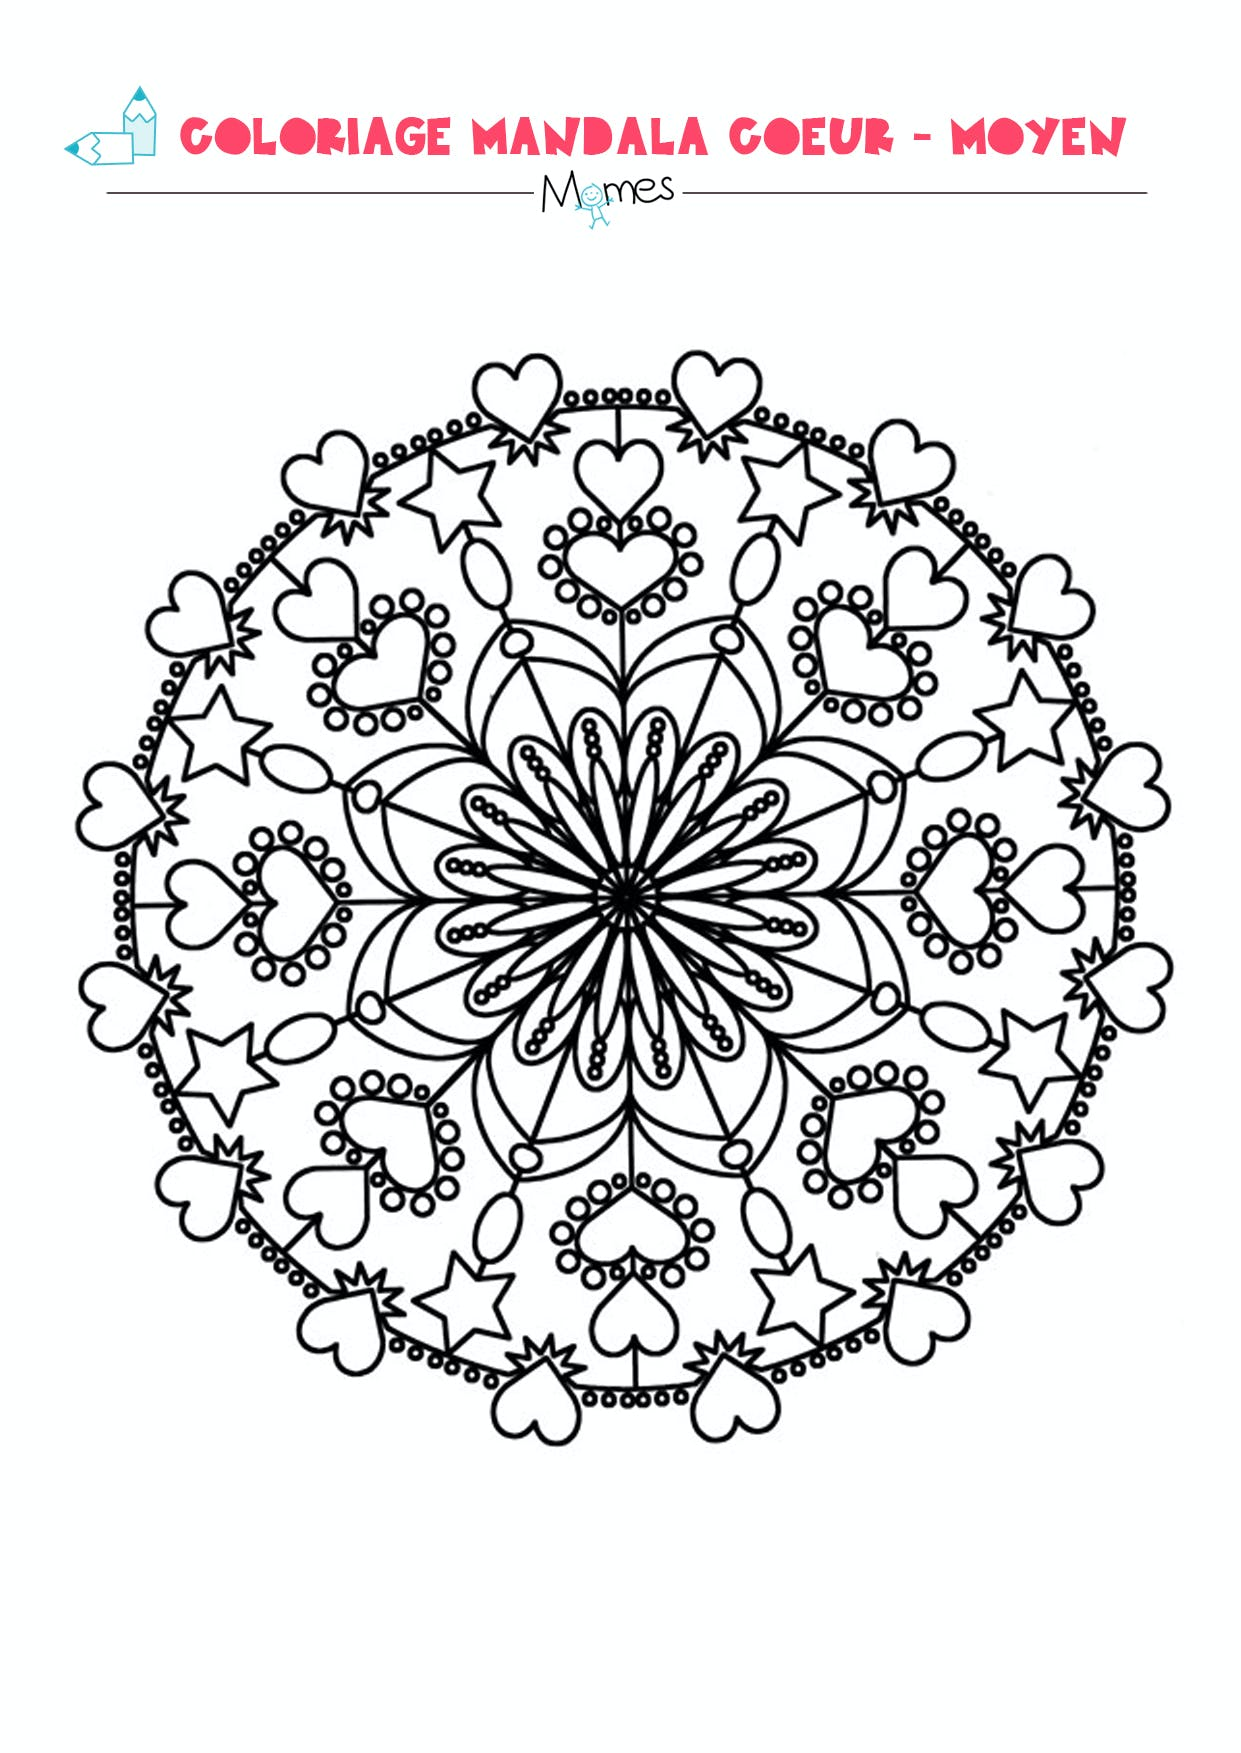 Mandala coeur colorier moyen - Mandala de coeur ...